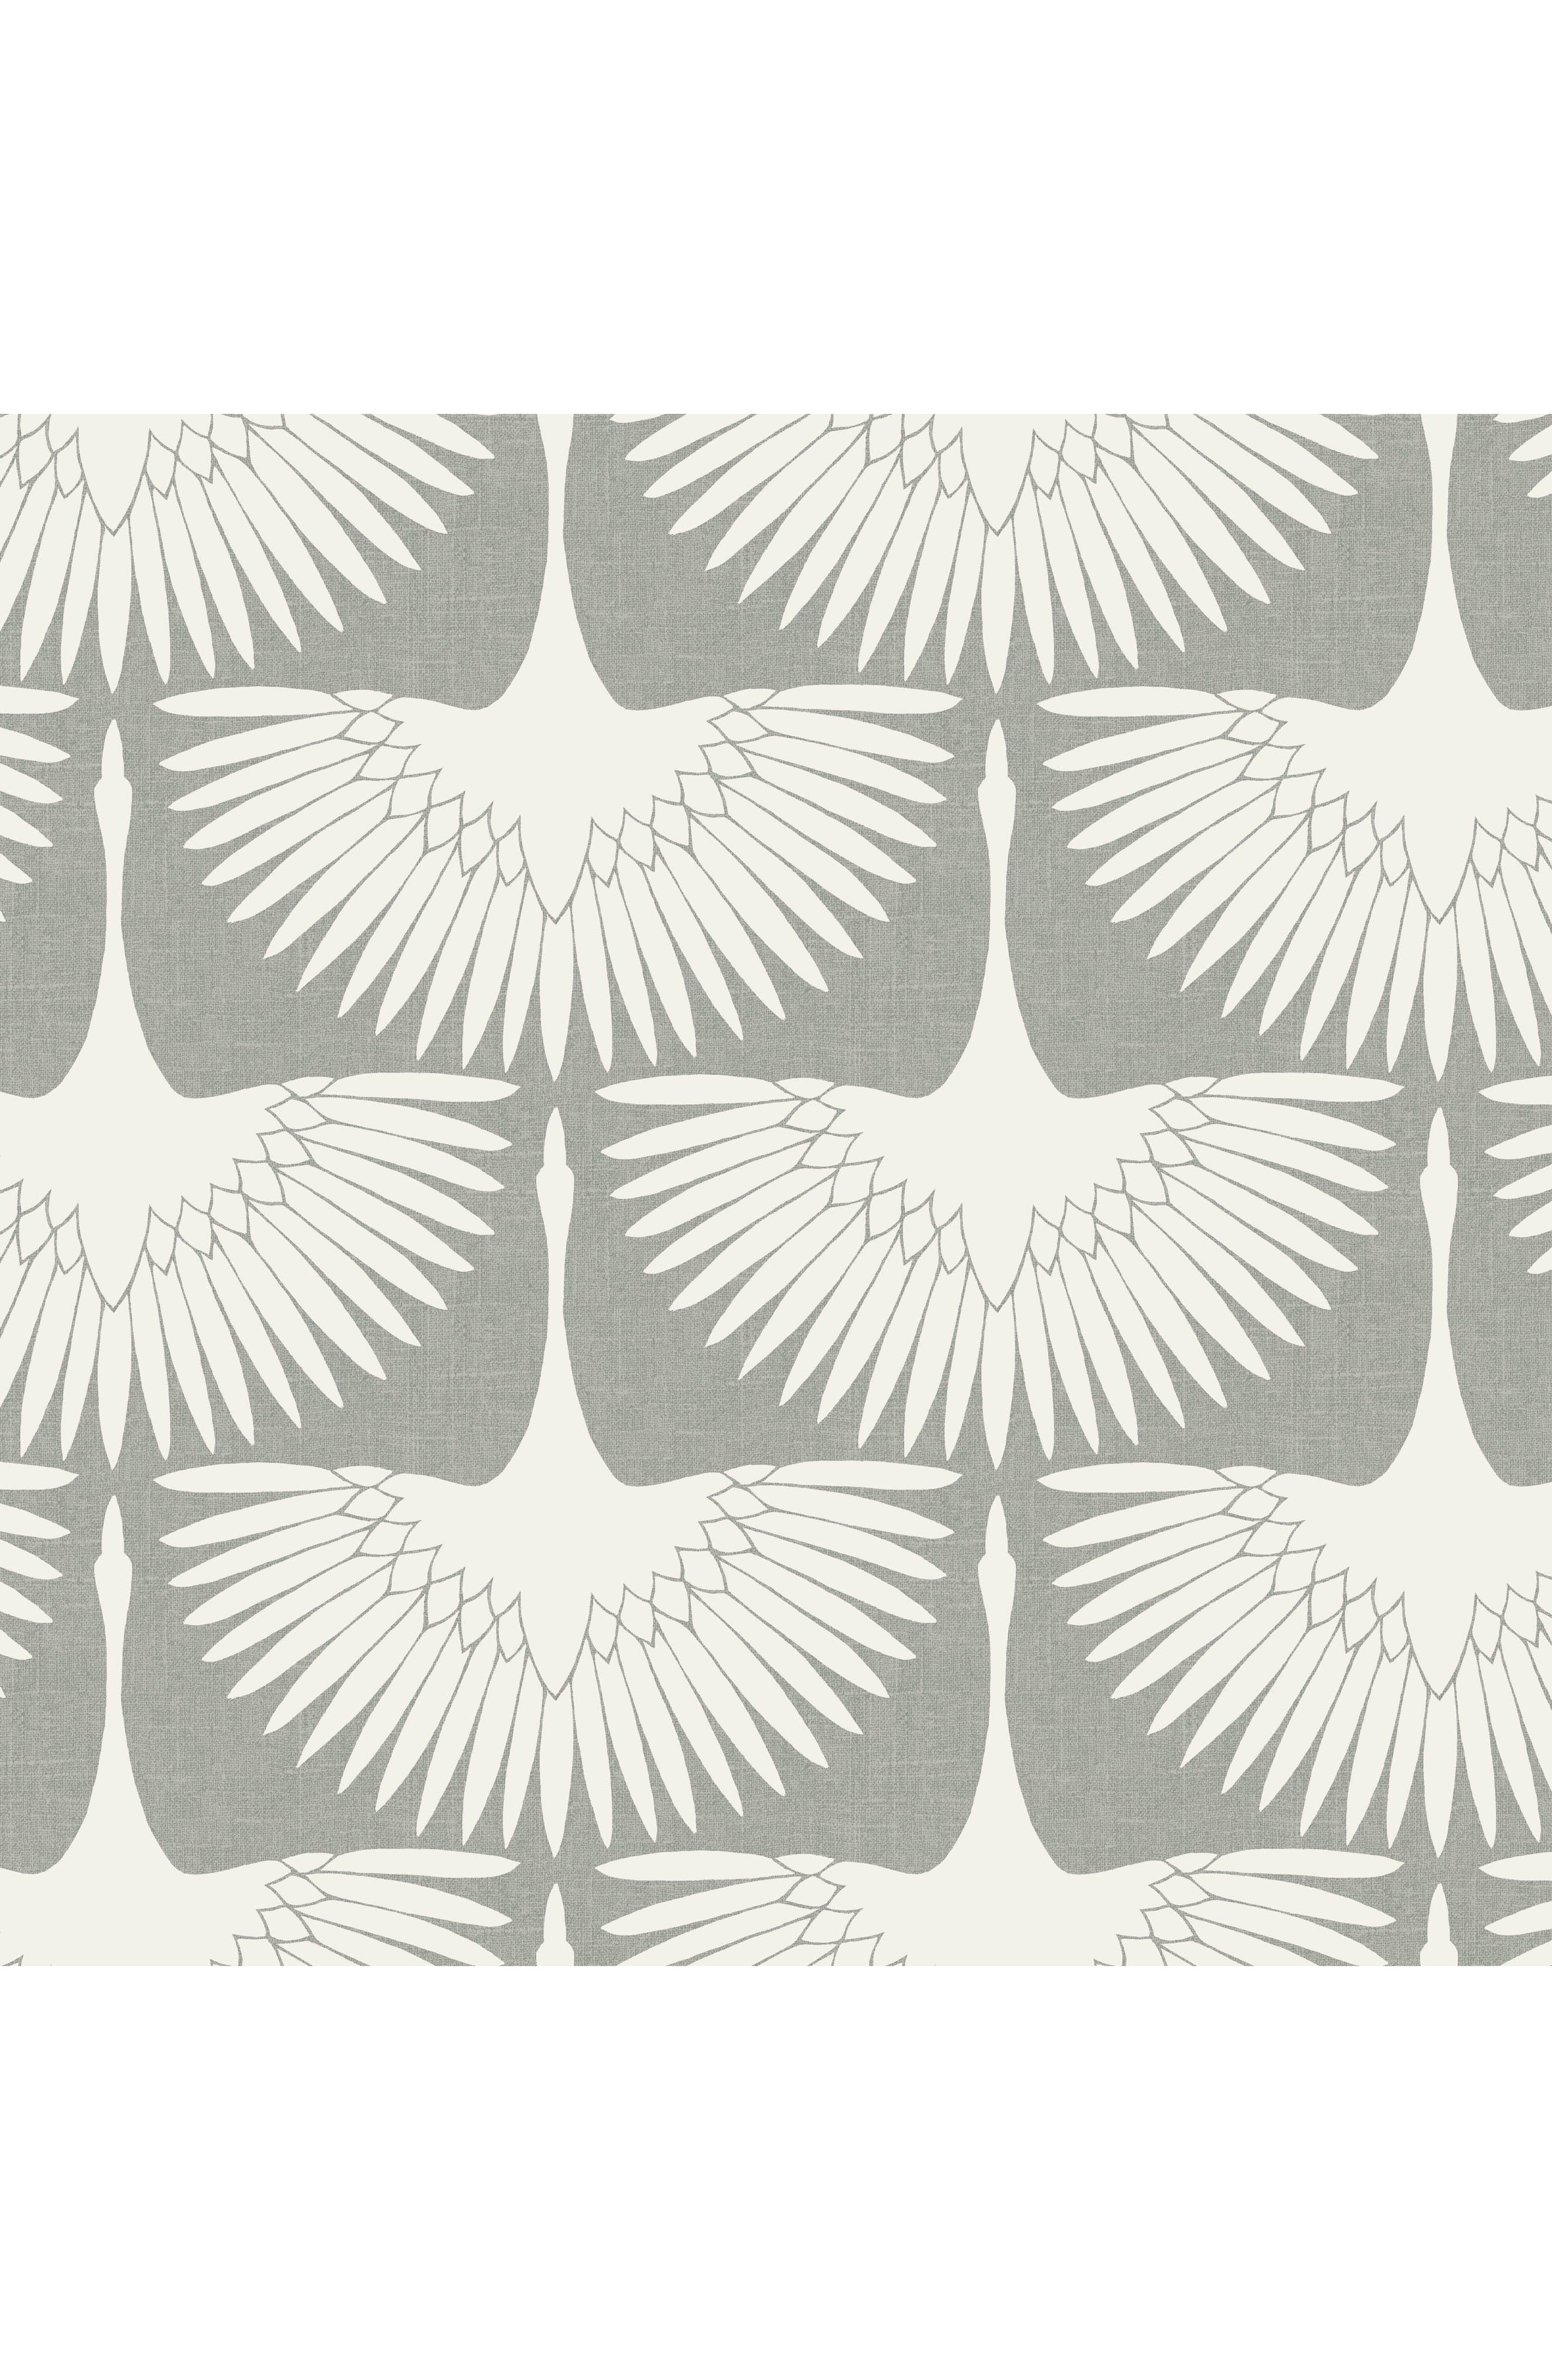 Tempaper Feather Flock Vinyl Wallpaper